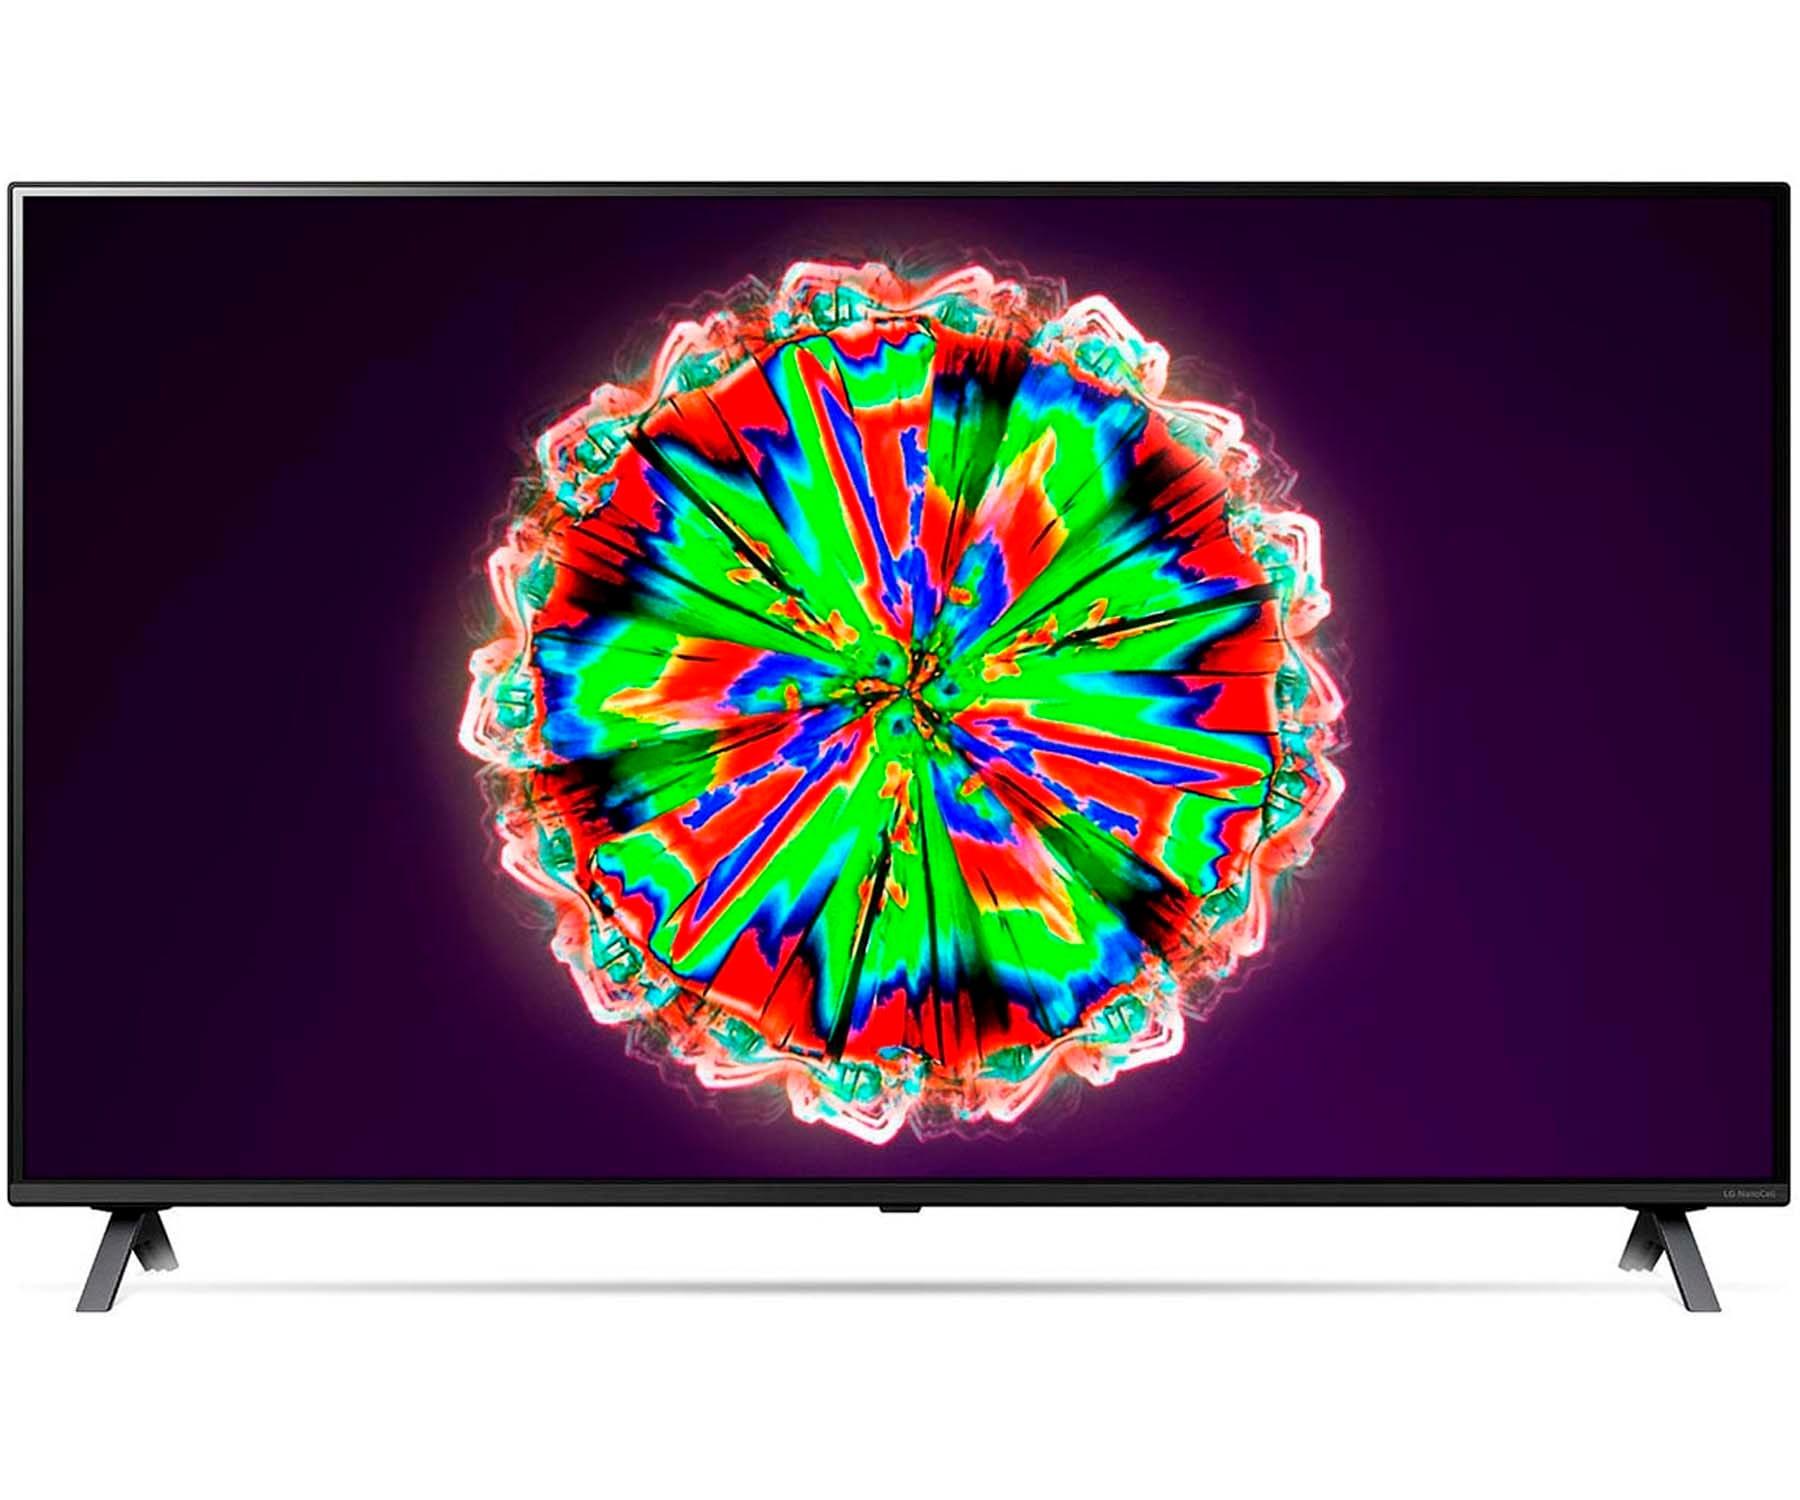 LG 49NANO806NA TELEVISOR 49'' NANOCELL UHD IPS 4K HDR SMART TV CON IA WIFI BLUETOOTH